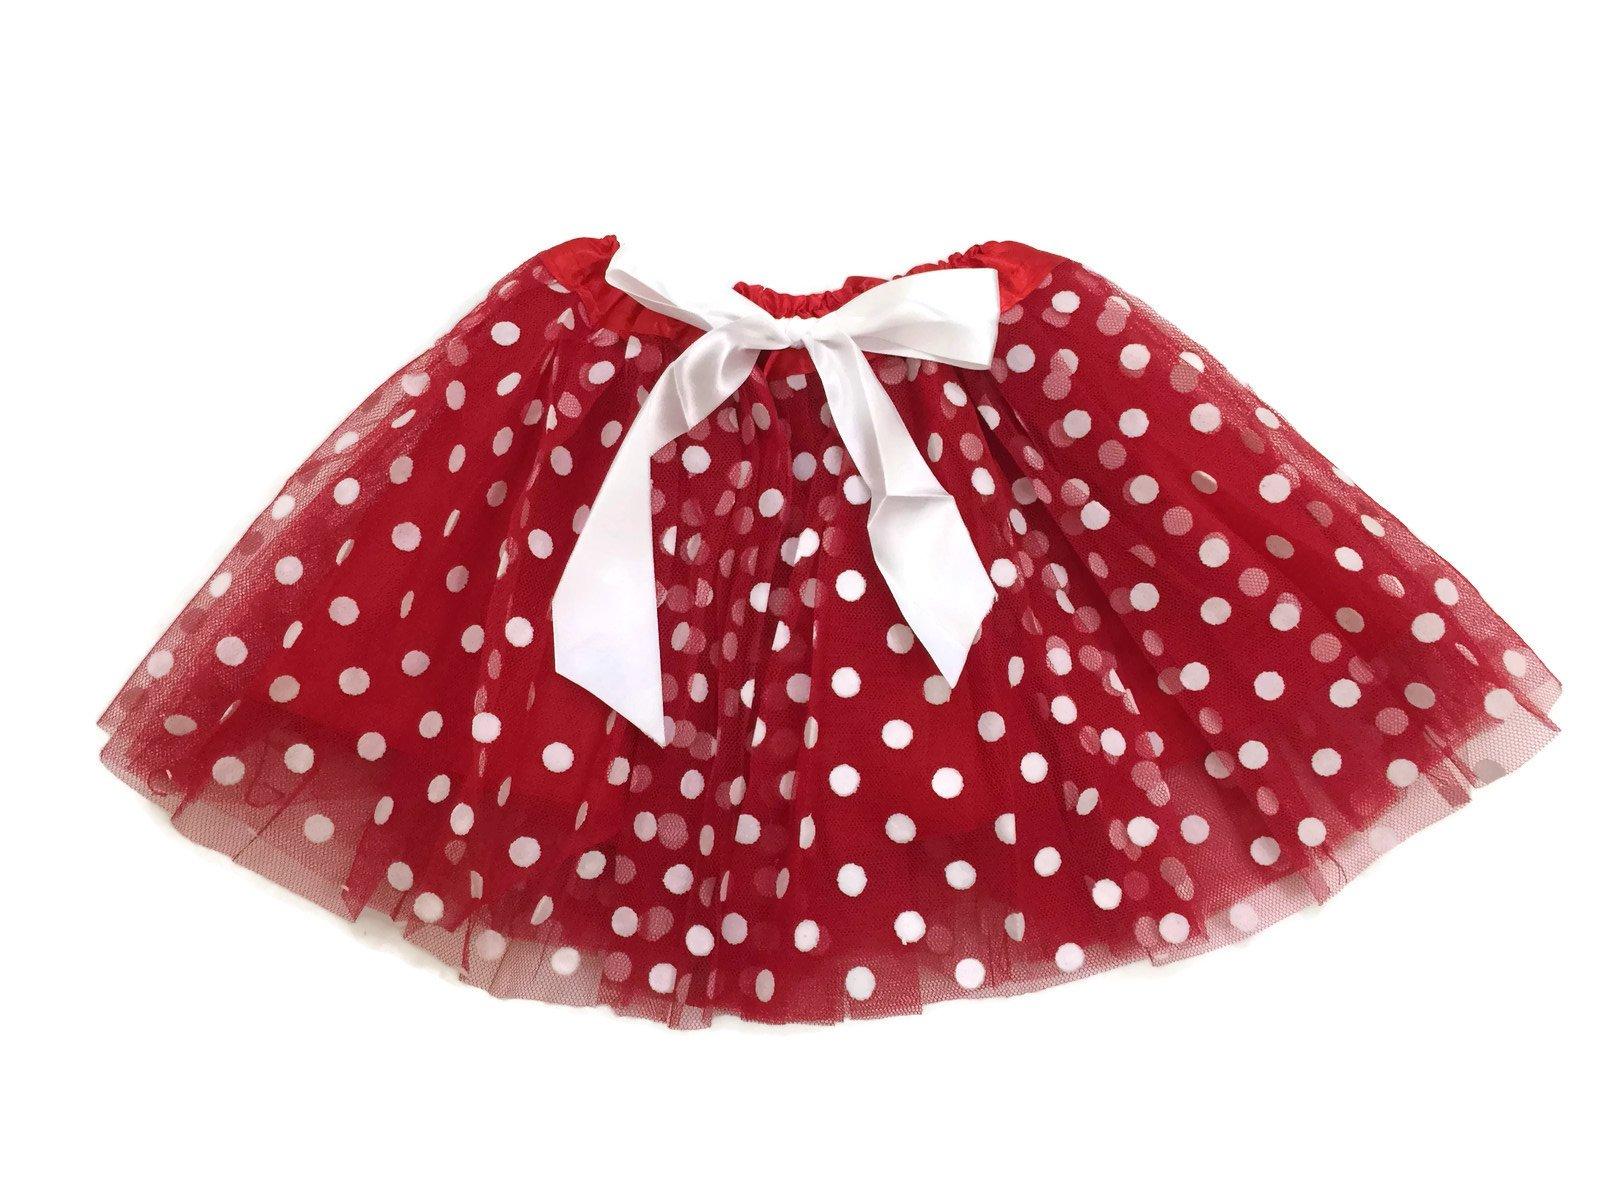 Rush Dance Princess Ballet Fairy Party Tutus - Tutu, Skirt, Costume Favors Set (25 Packs, Red & White Polkadots Ribbon)